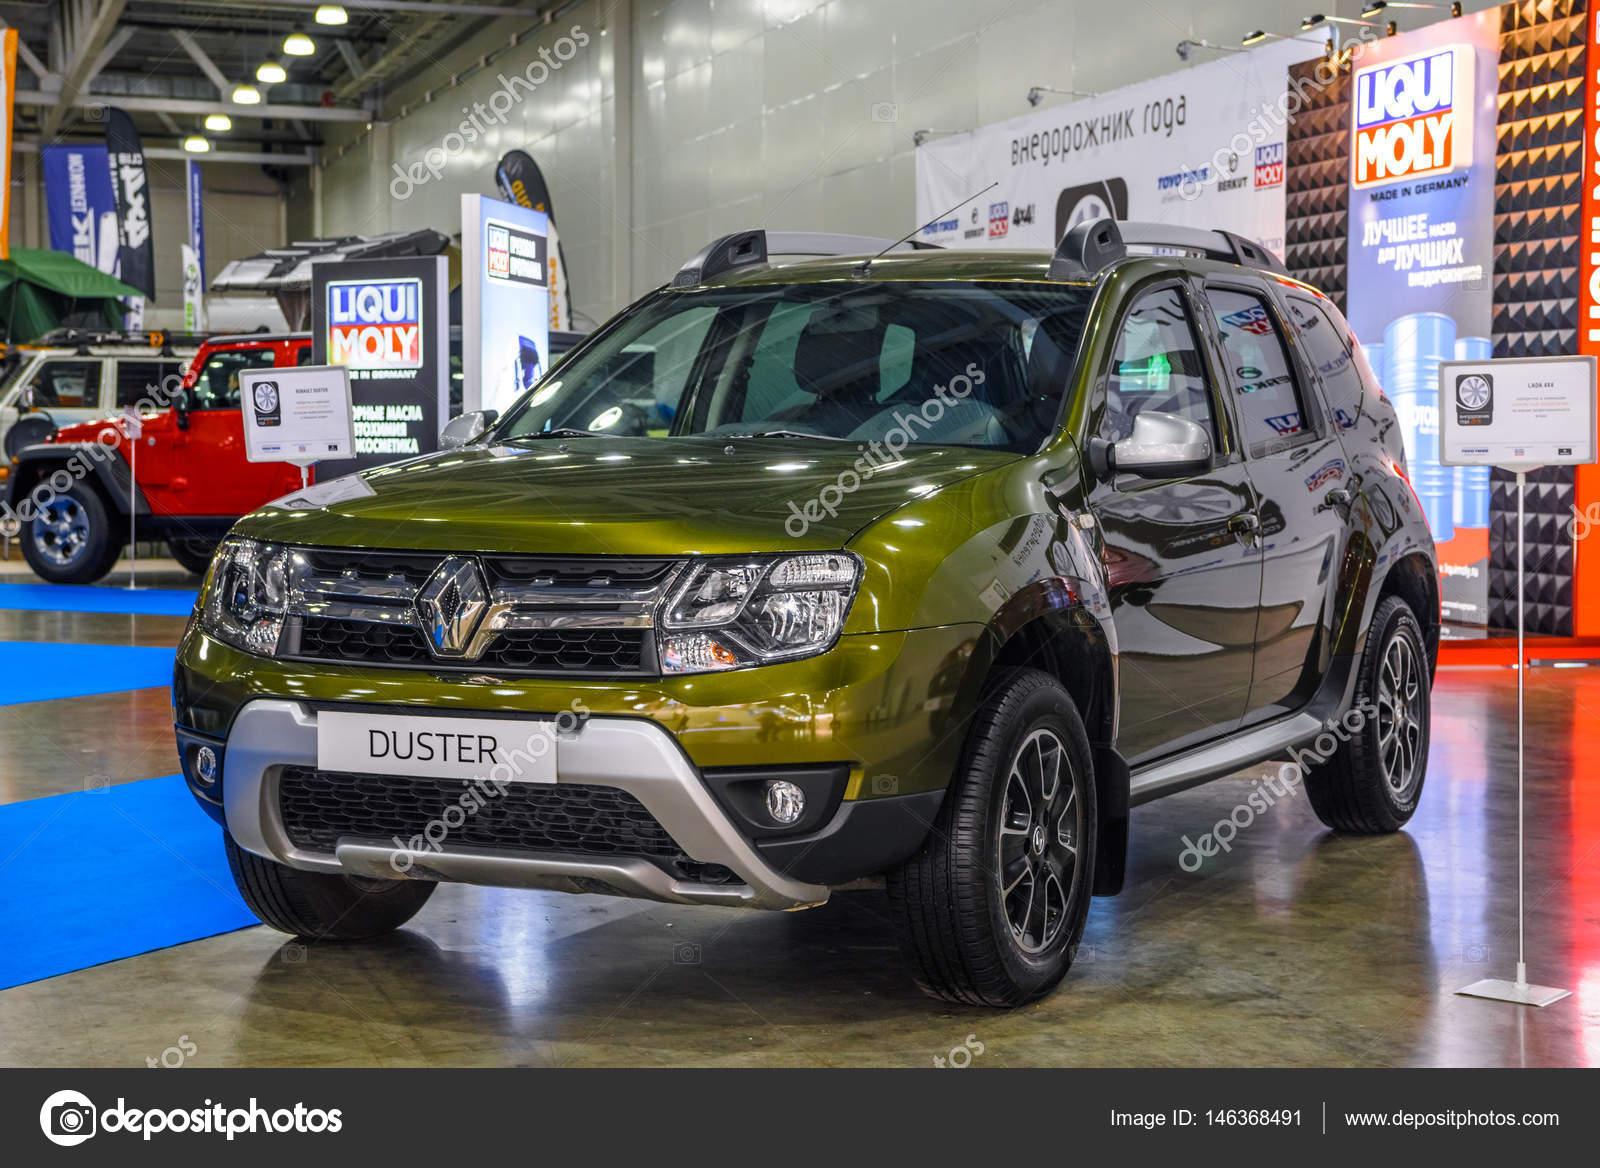 москва августа 2016 Renault Duster представлены на ммас